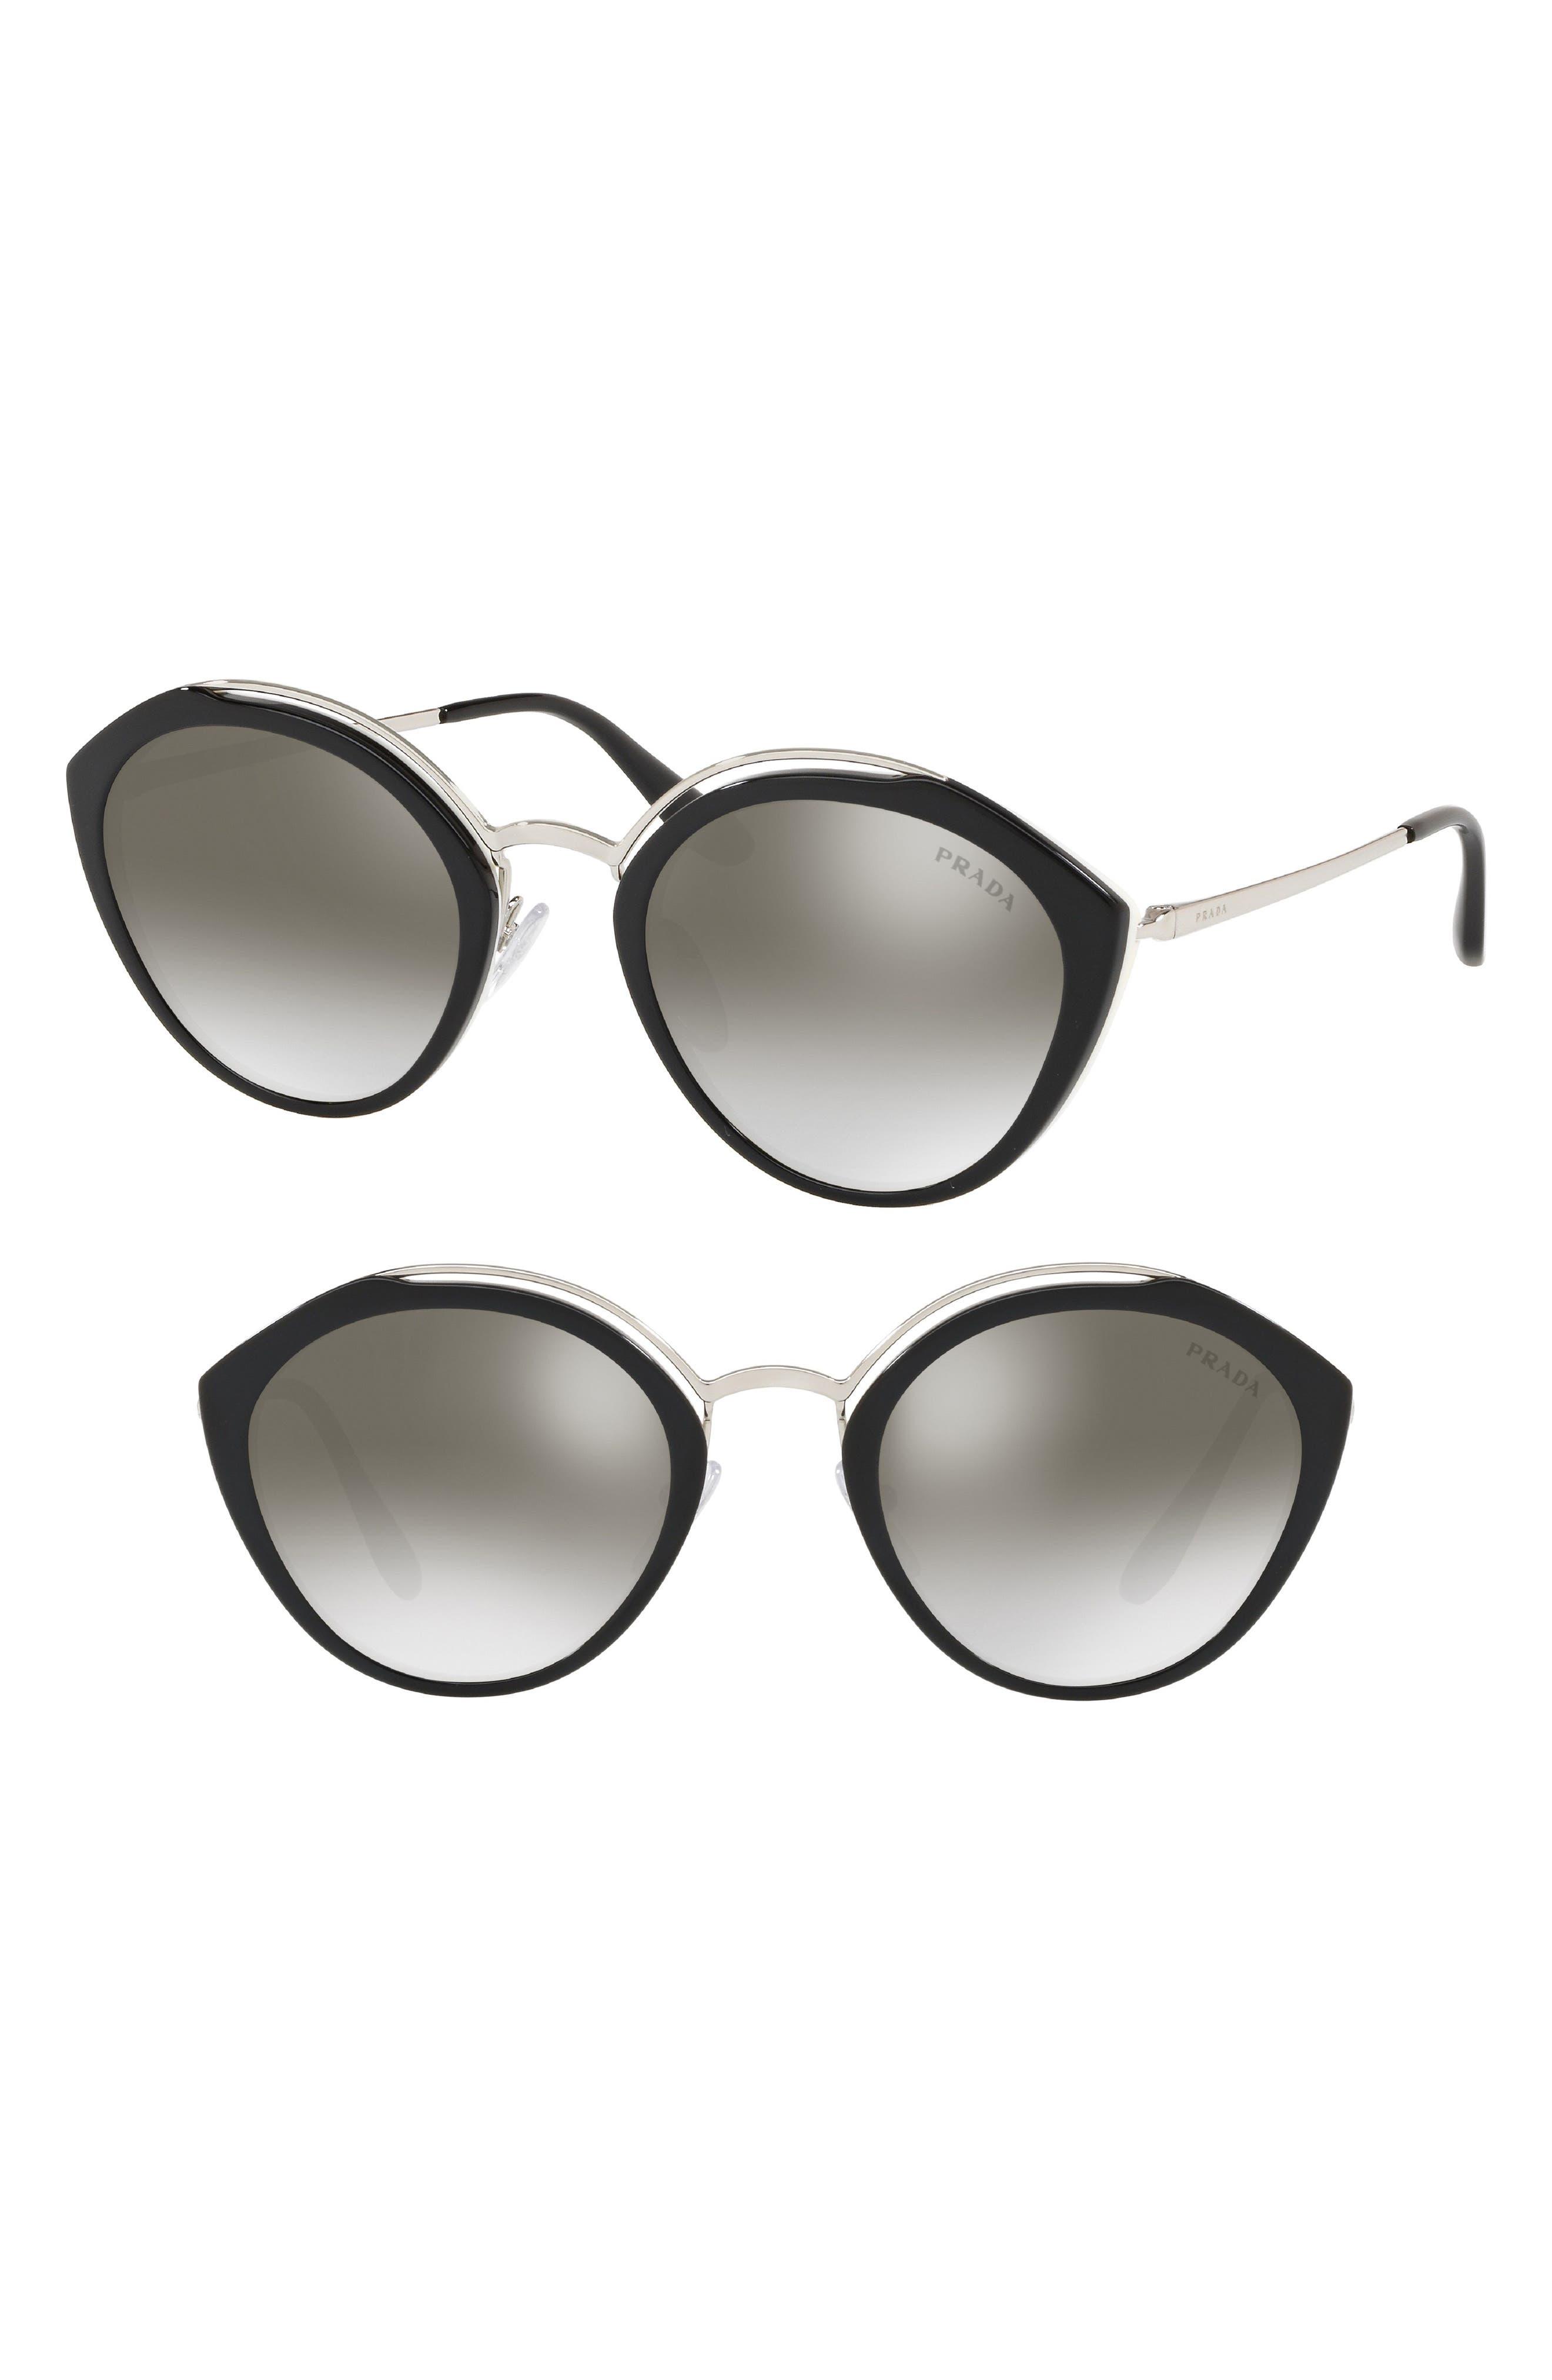 53mm Round Sunglasses,                         Main,                         color, BLACK/ IVORY GRADIENT MIRROR